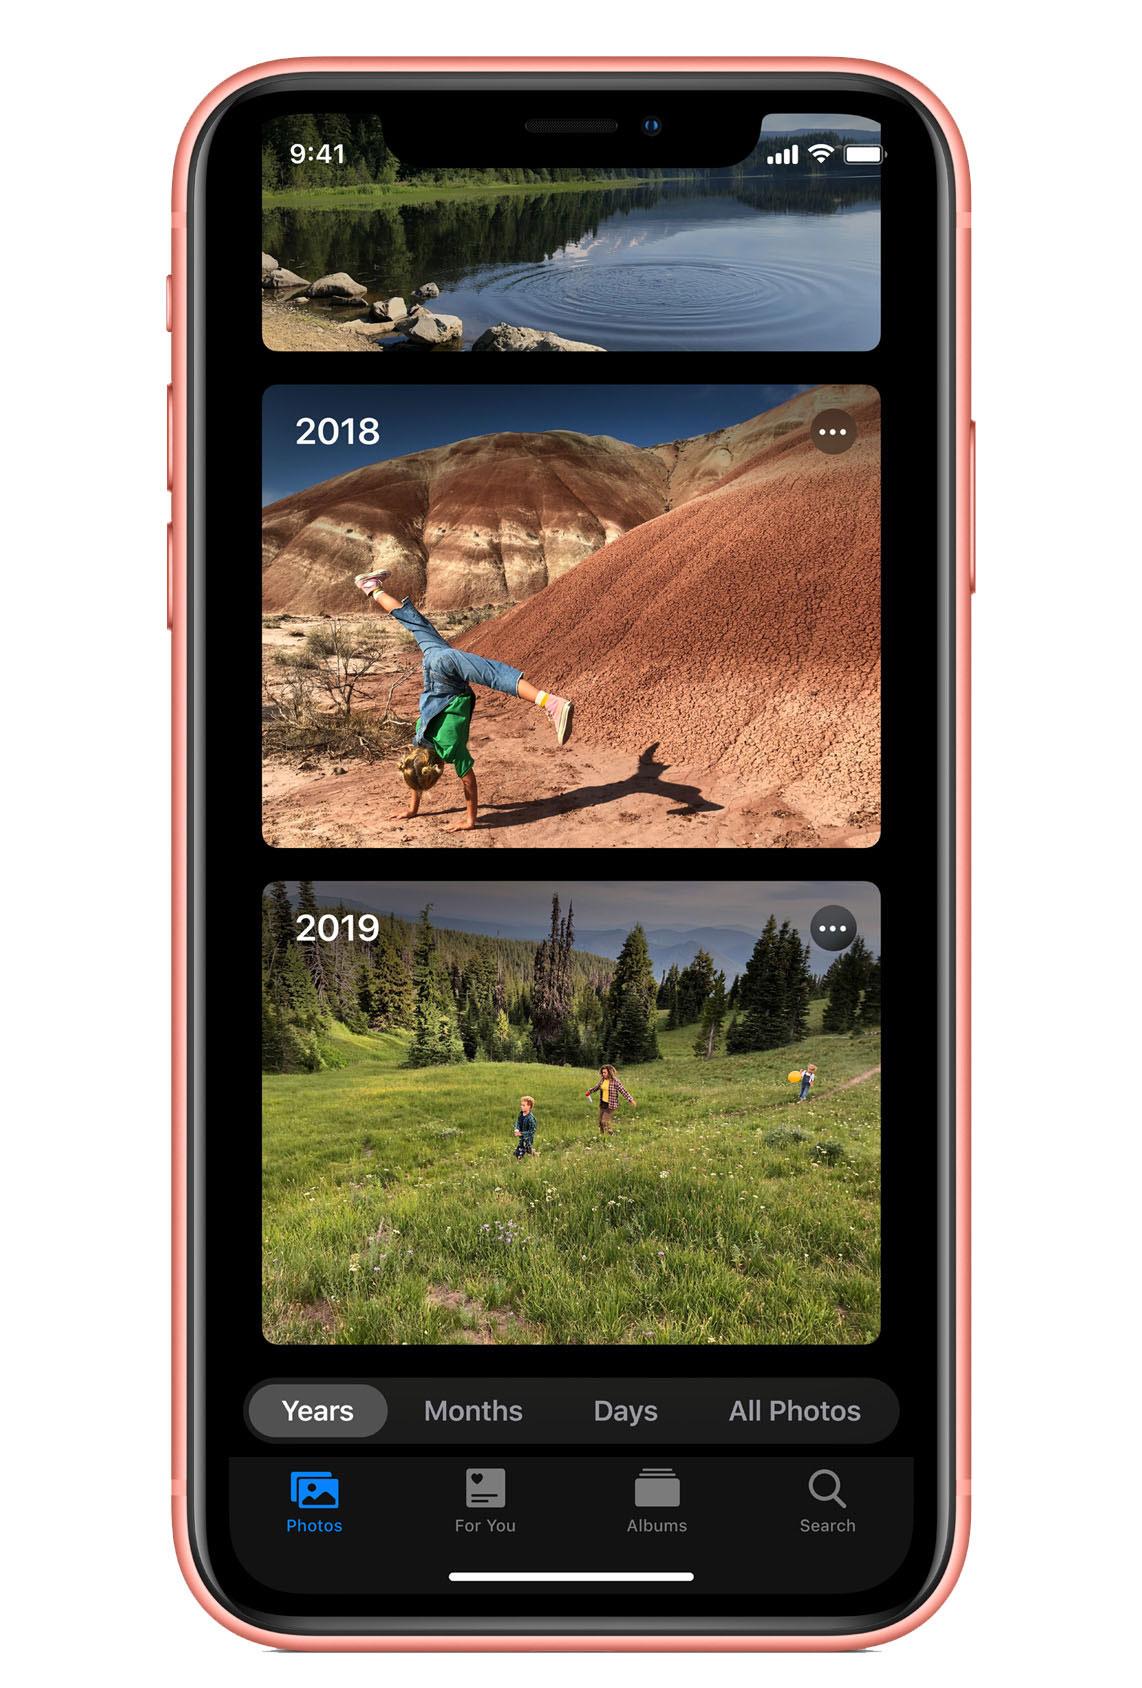 https://www.macfreak.nl/modules/news/images/zArt.iOS13Photos-iPhone-1.jpg